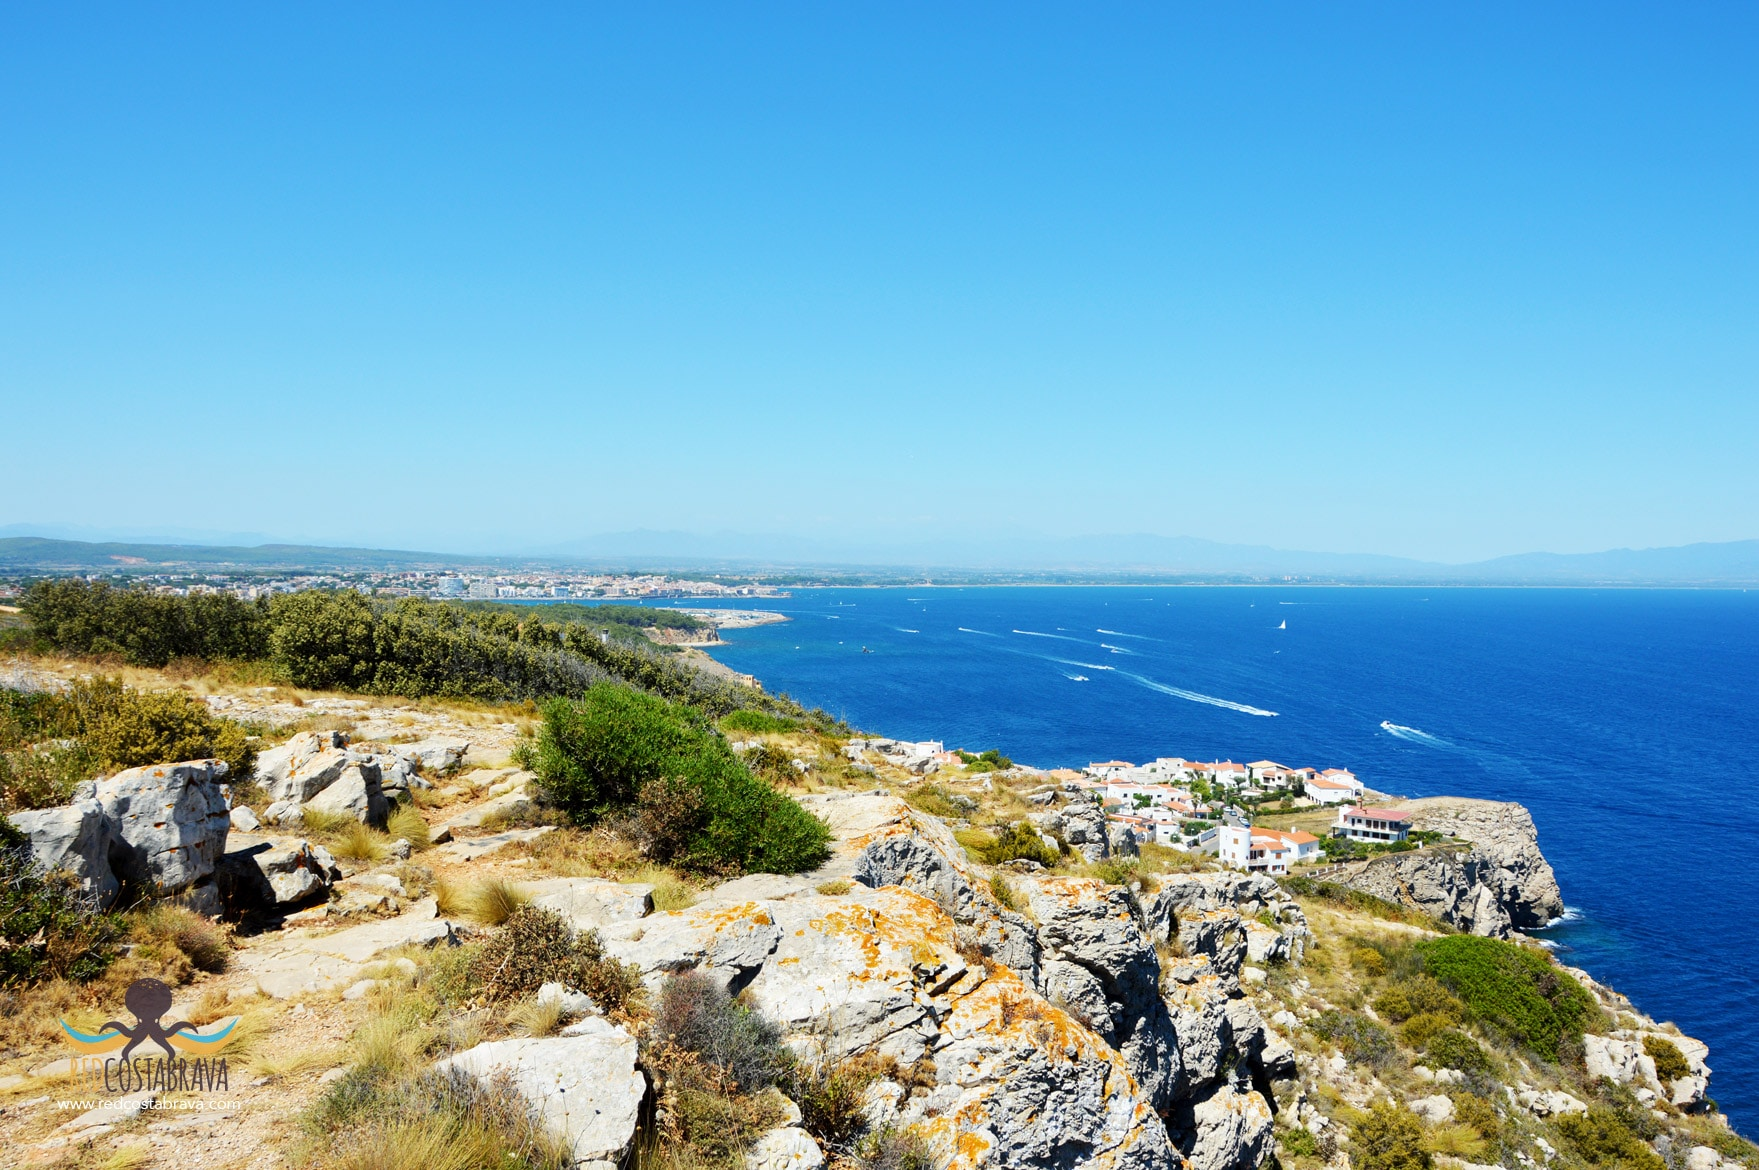 vista desde mirador Torre Montgó - l'Escala